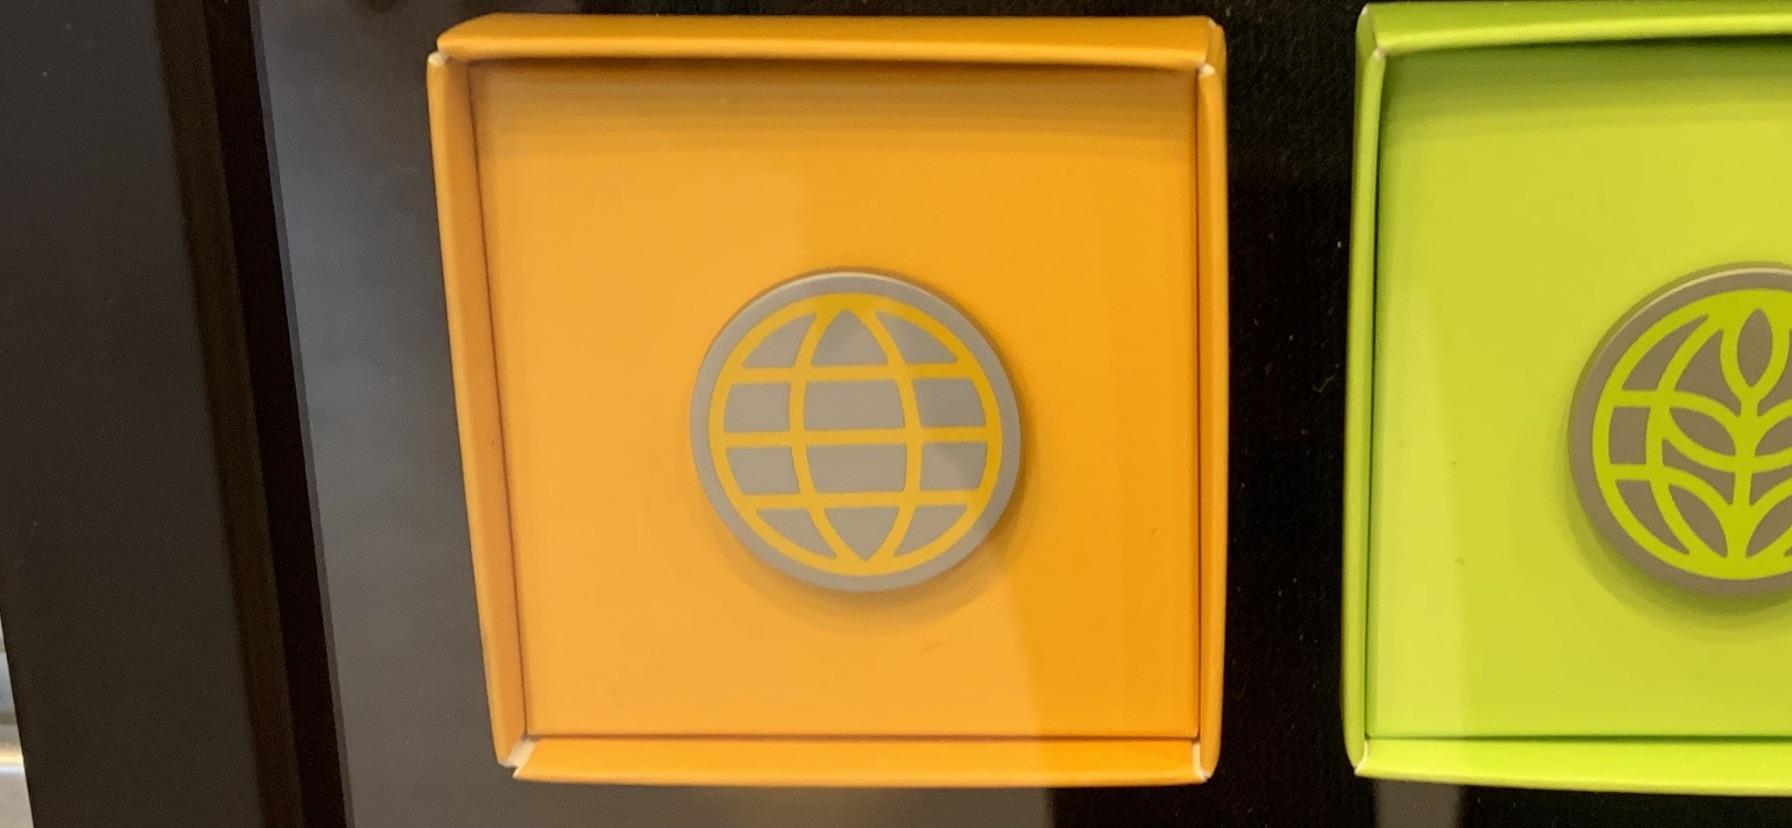 EPCOT pavilion logo pins 12/23/19 19